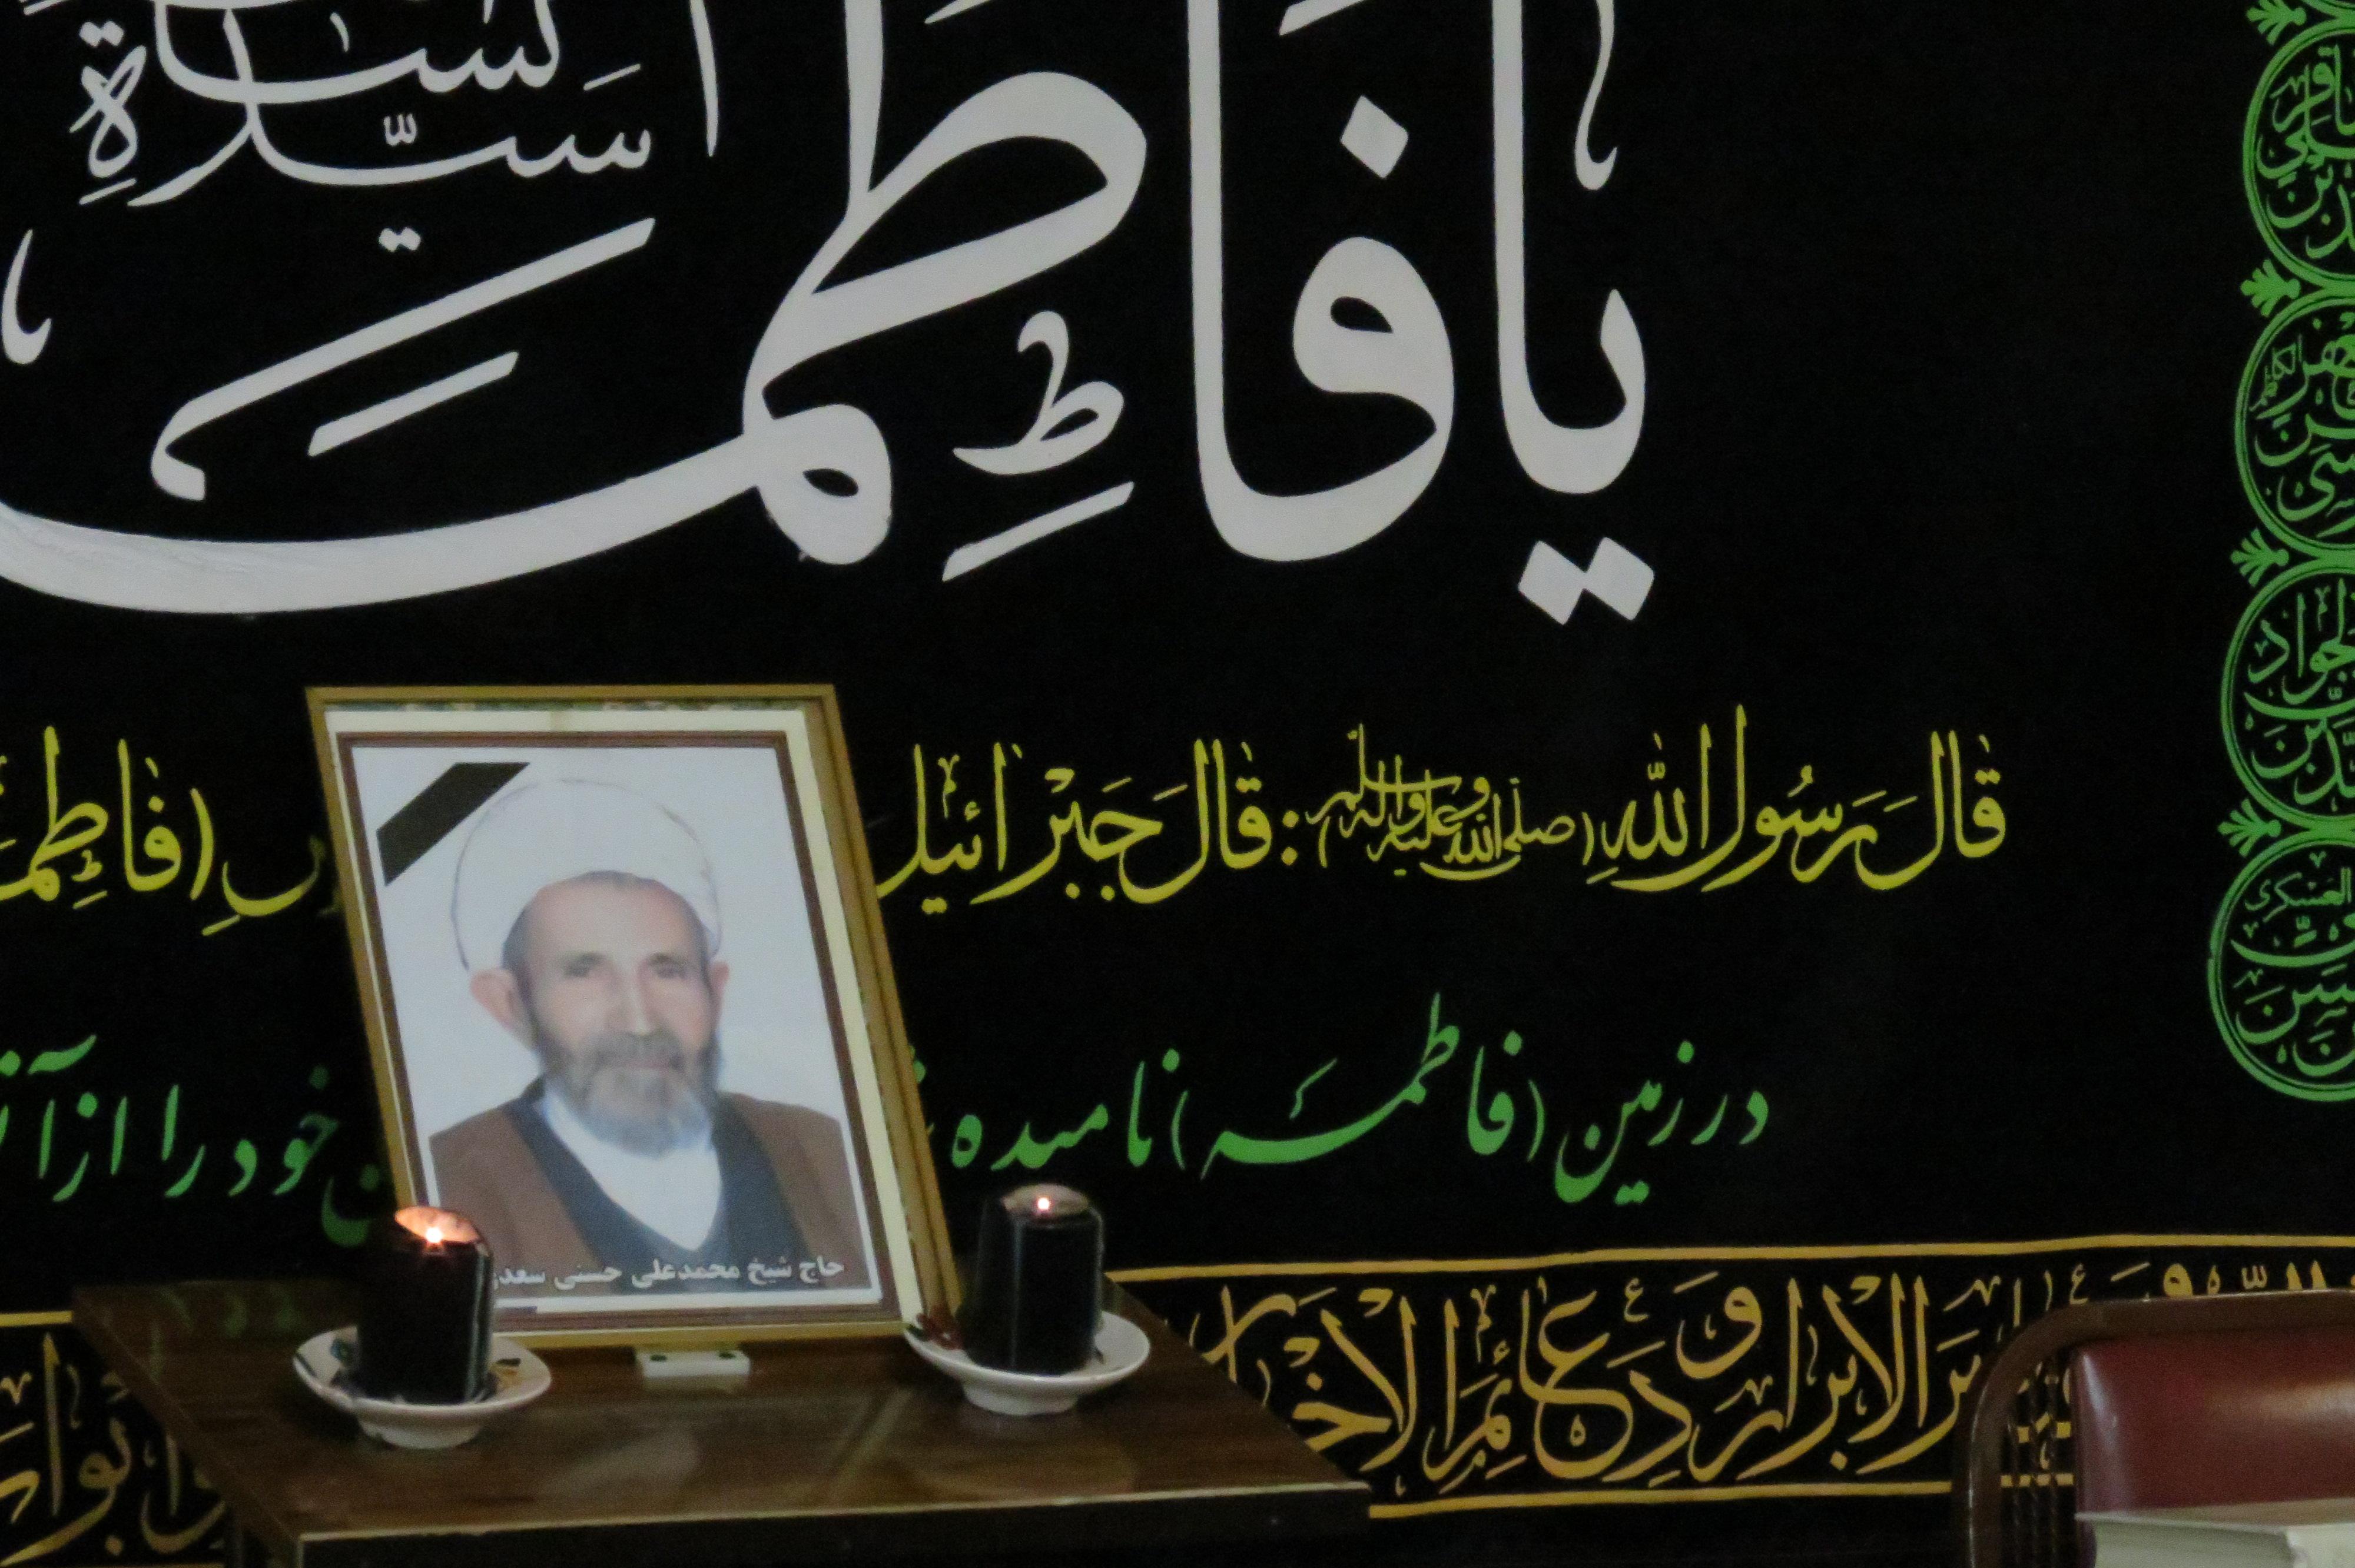 مراسم یادبود حجت الاسلام حسنی